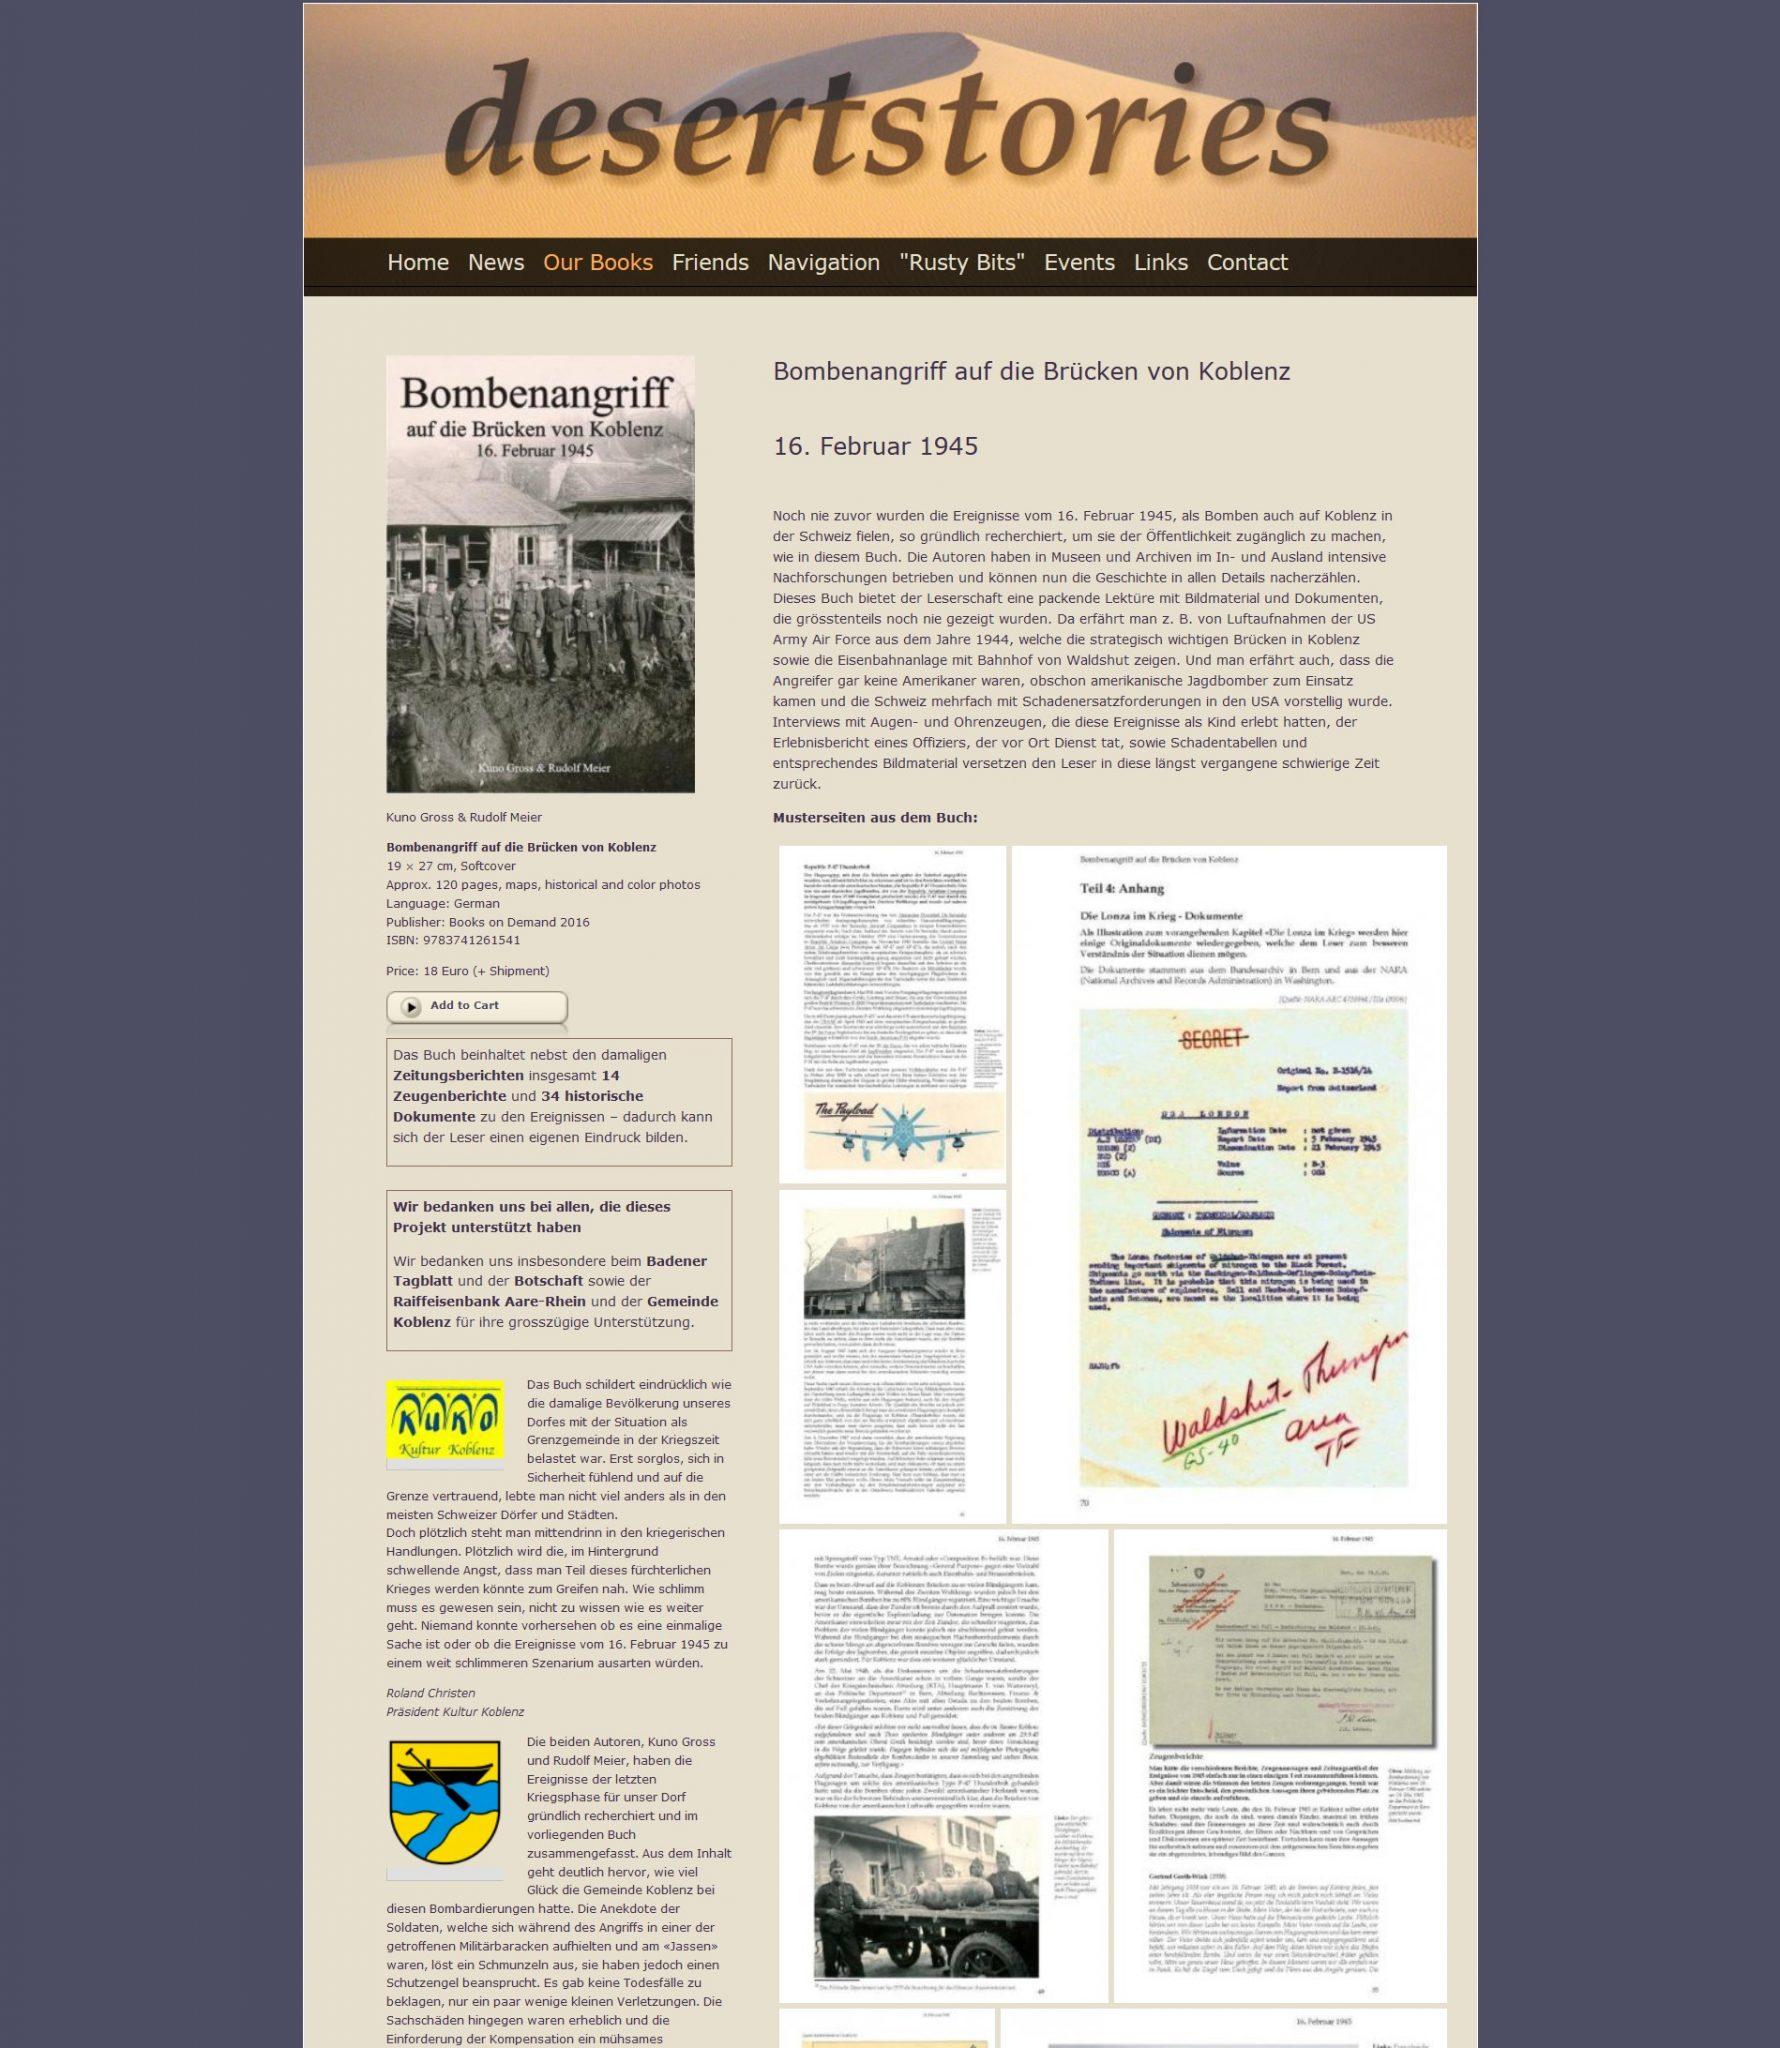 desertstories-fullpage